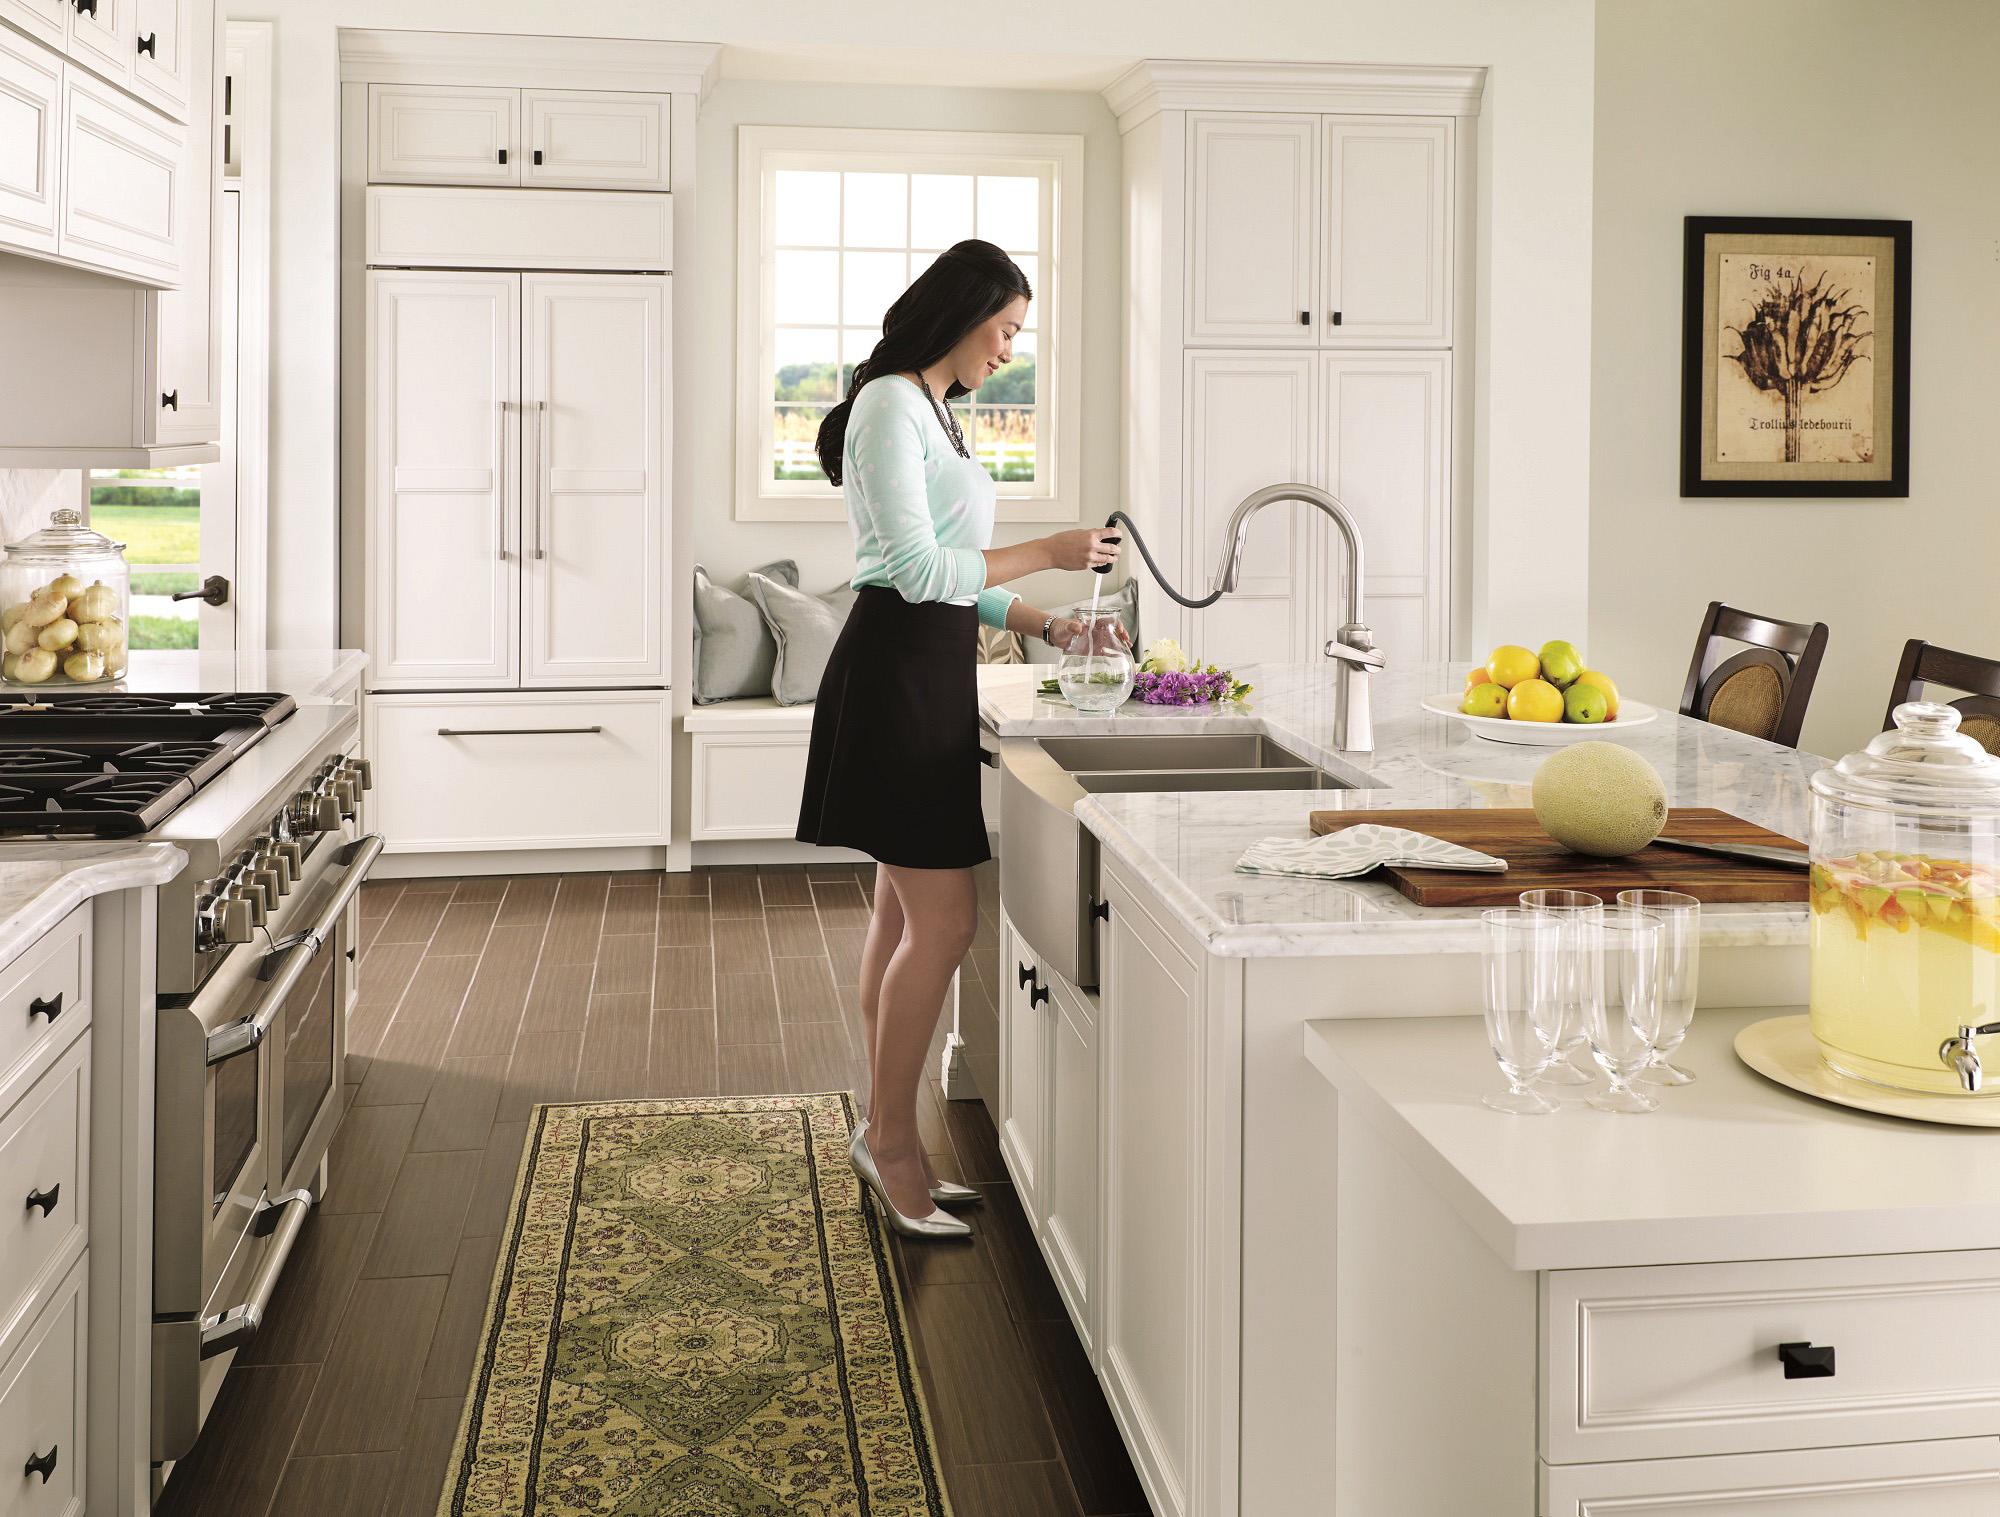 prweb moen kitchen faucet Moen Etch Pulldown Kitchen FaucetMoen Incorporated